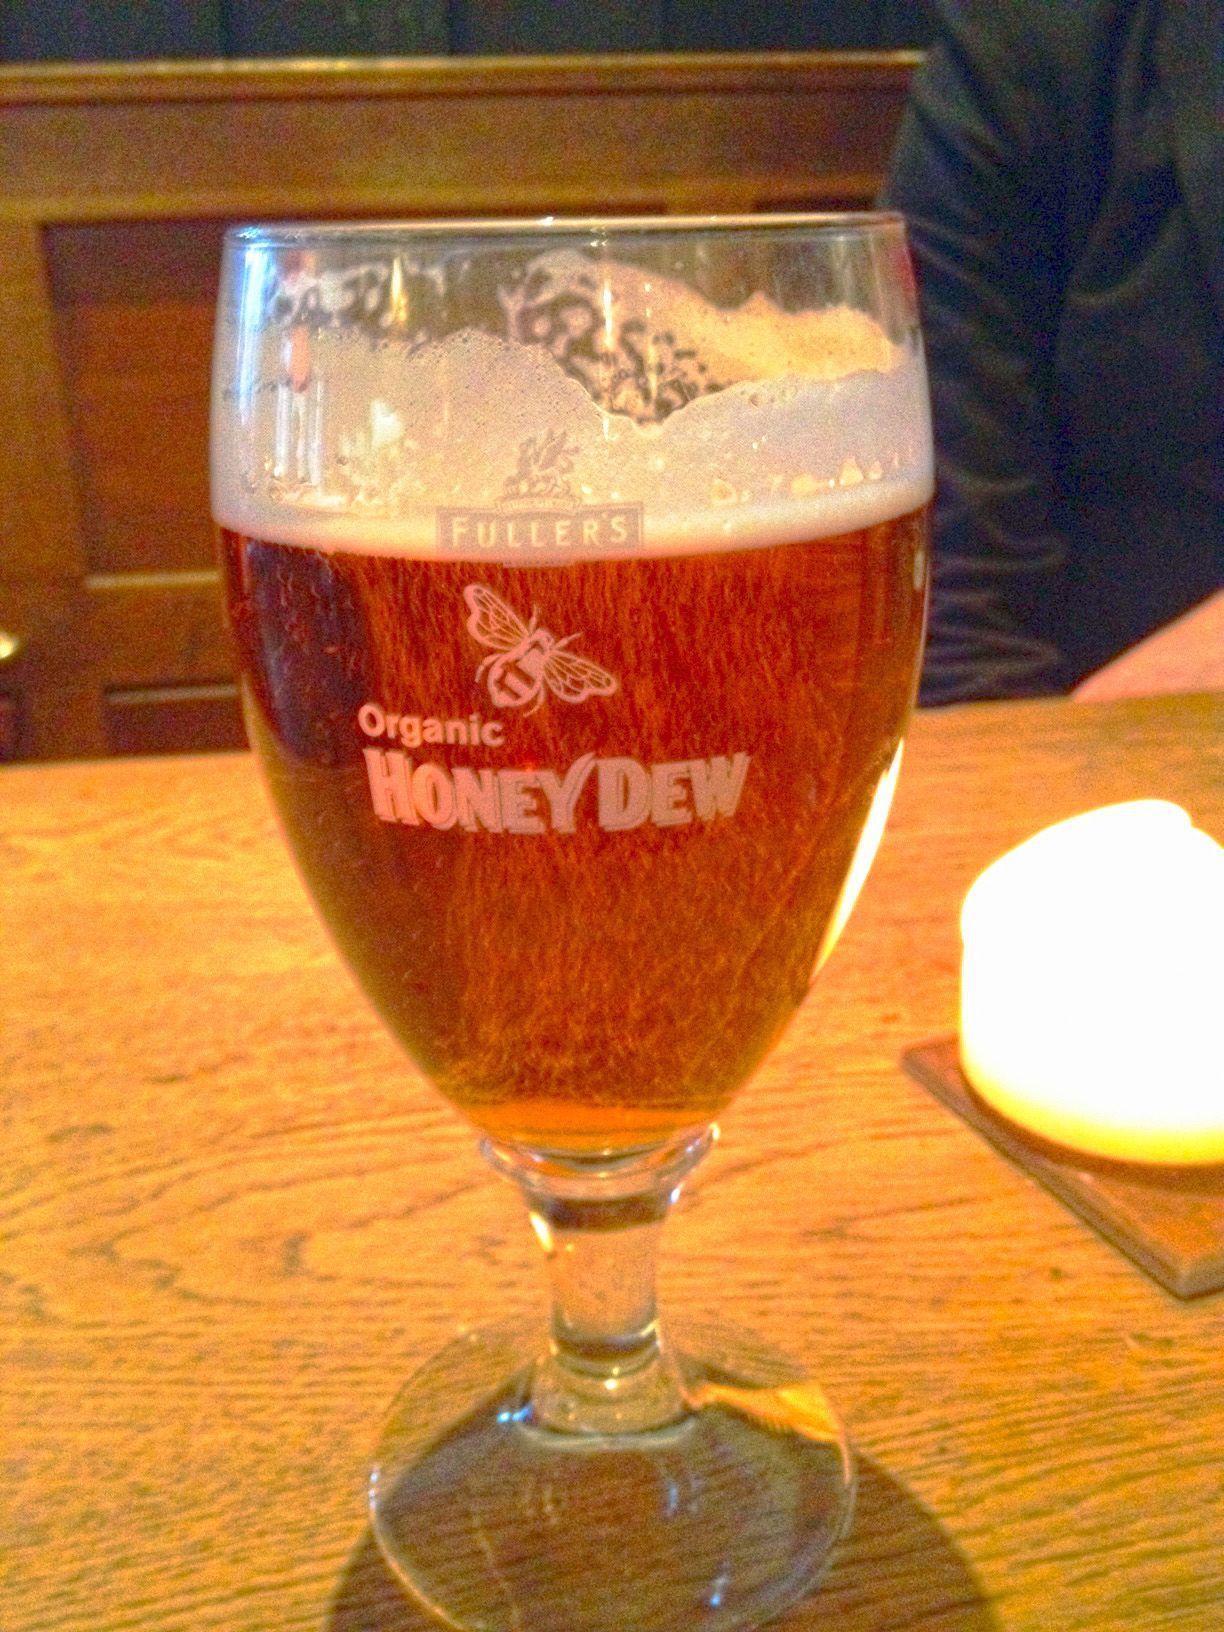 Fullers Honey Dew Organic Proper Champion Lager 5 5 Pints Pilsner Glass Pilsner Beer Glasses